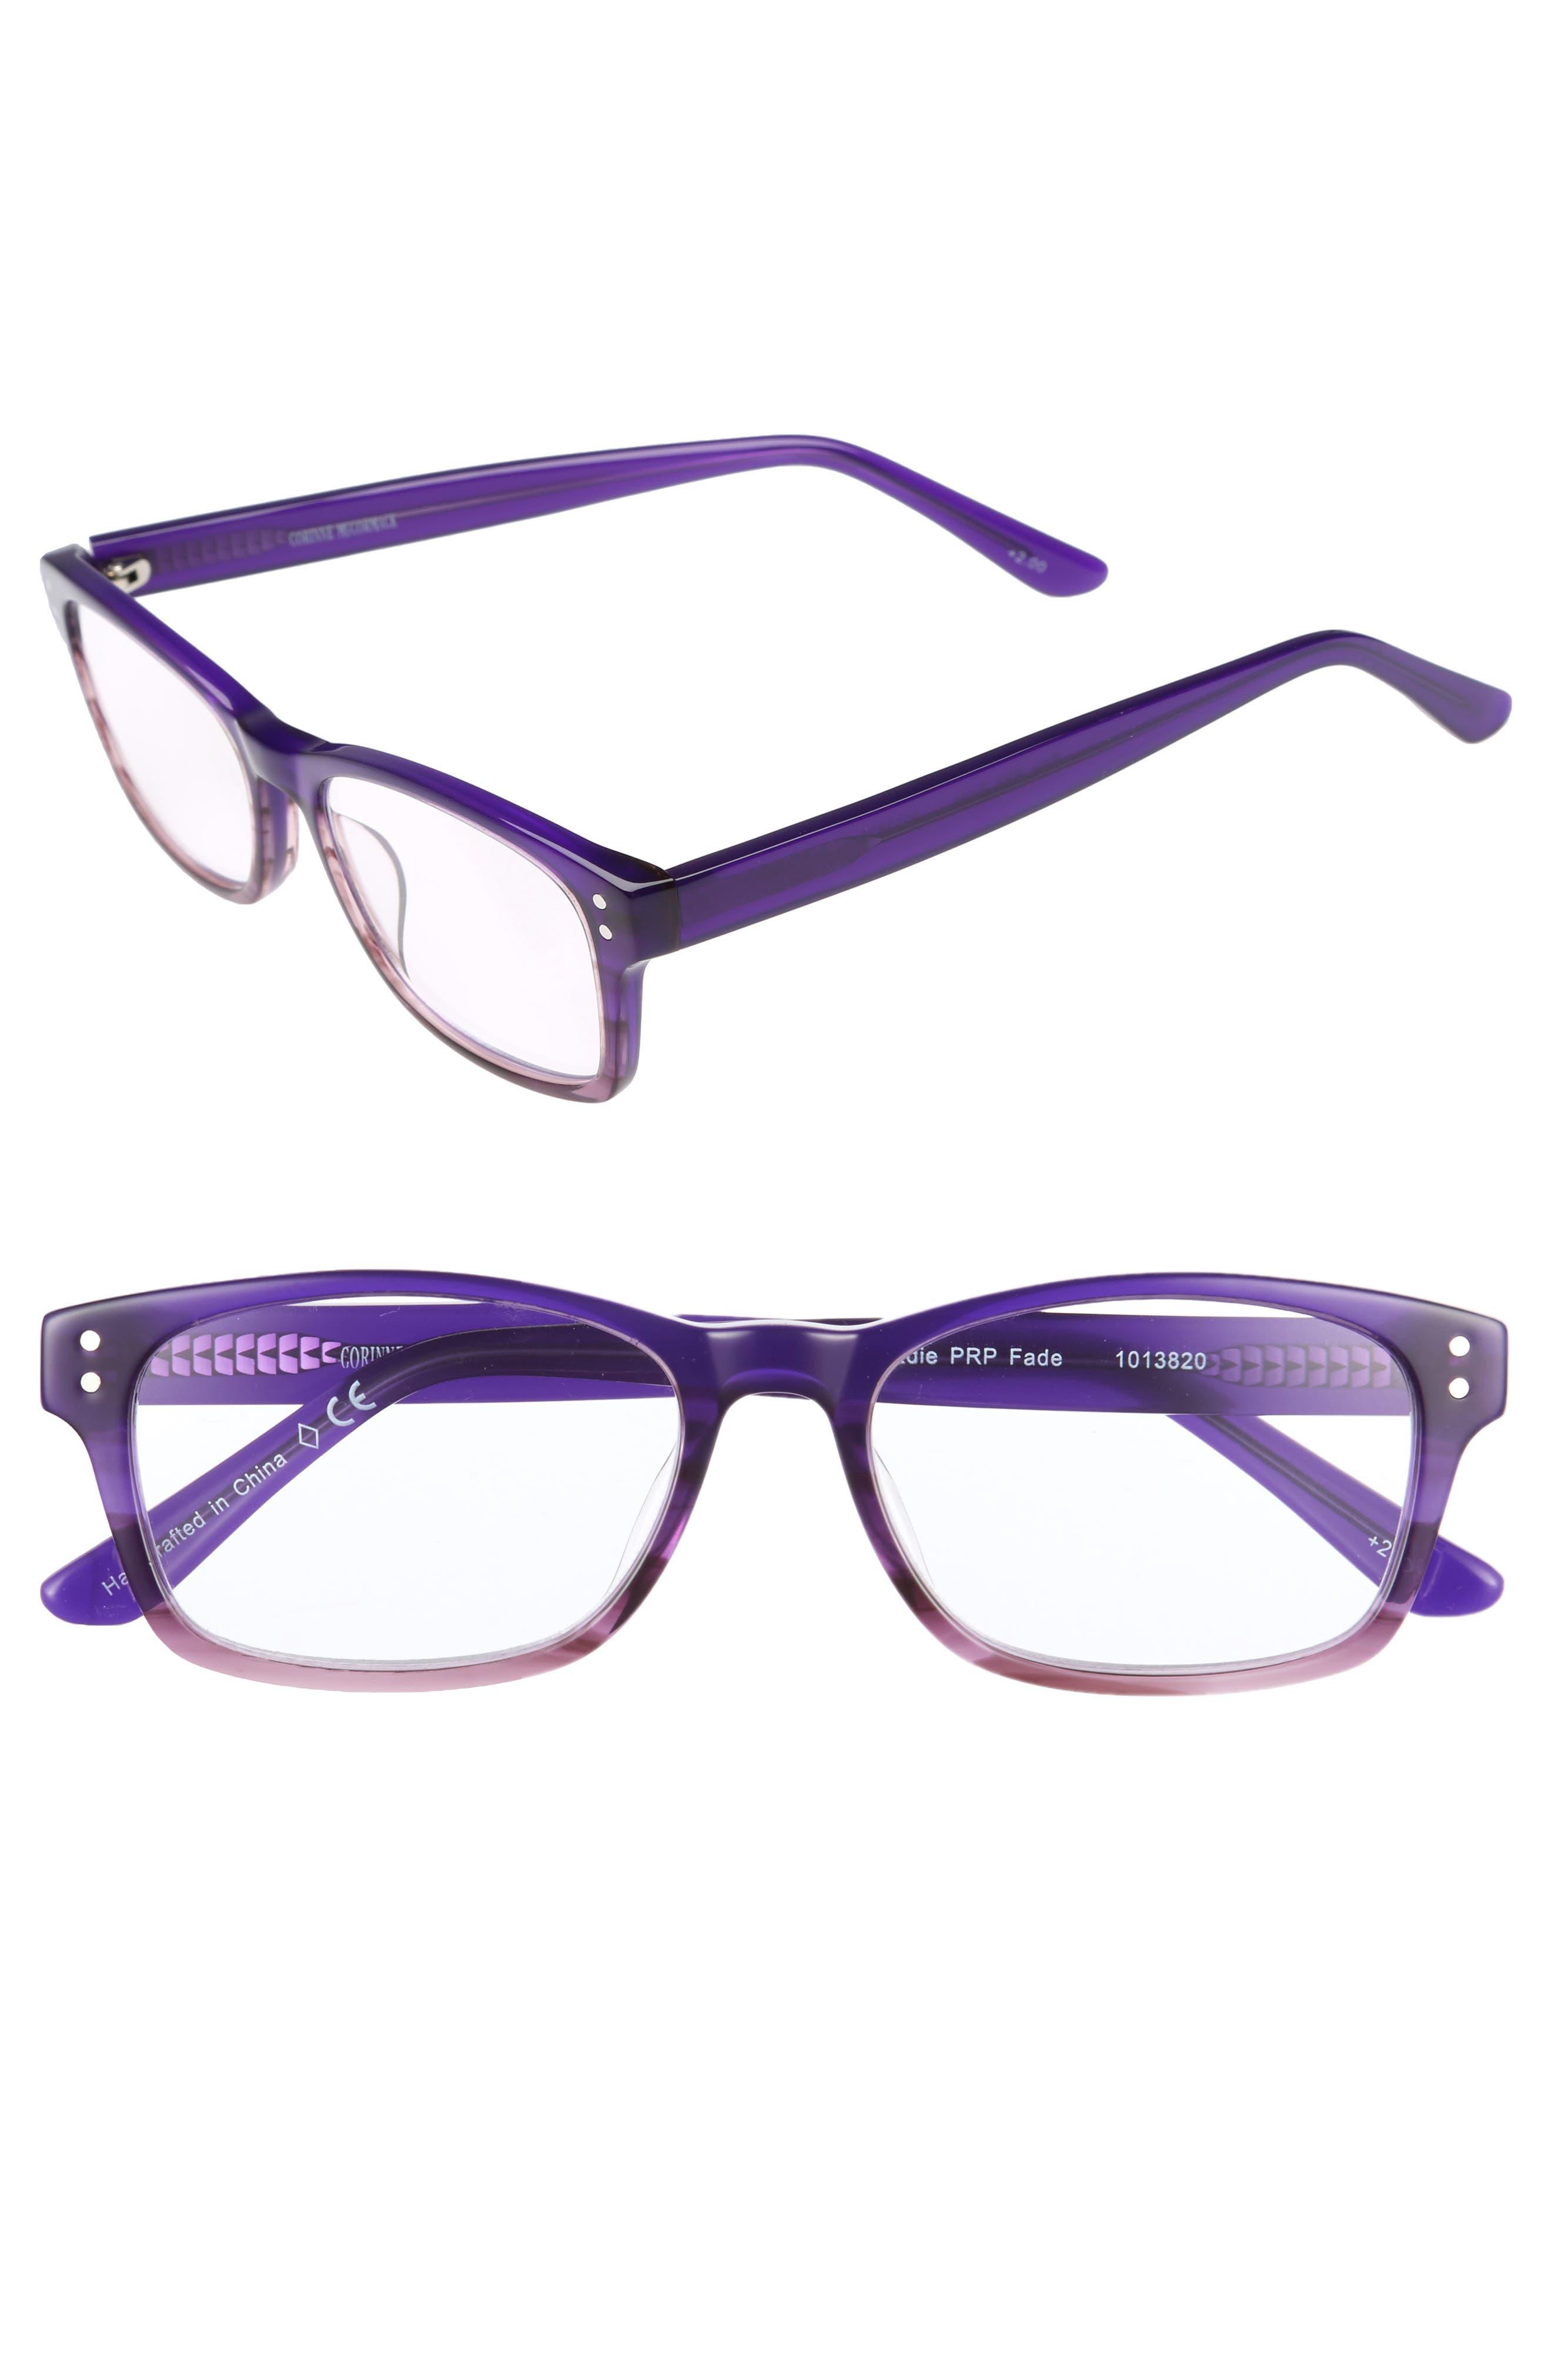 Edie 50mm Reading Glasses,                             Main thumbnail 1, color,                             500